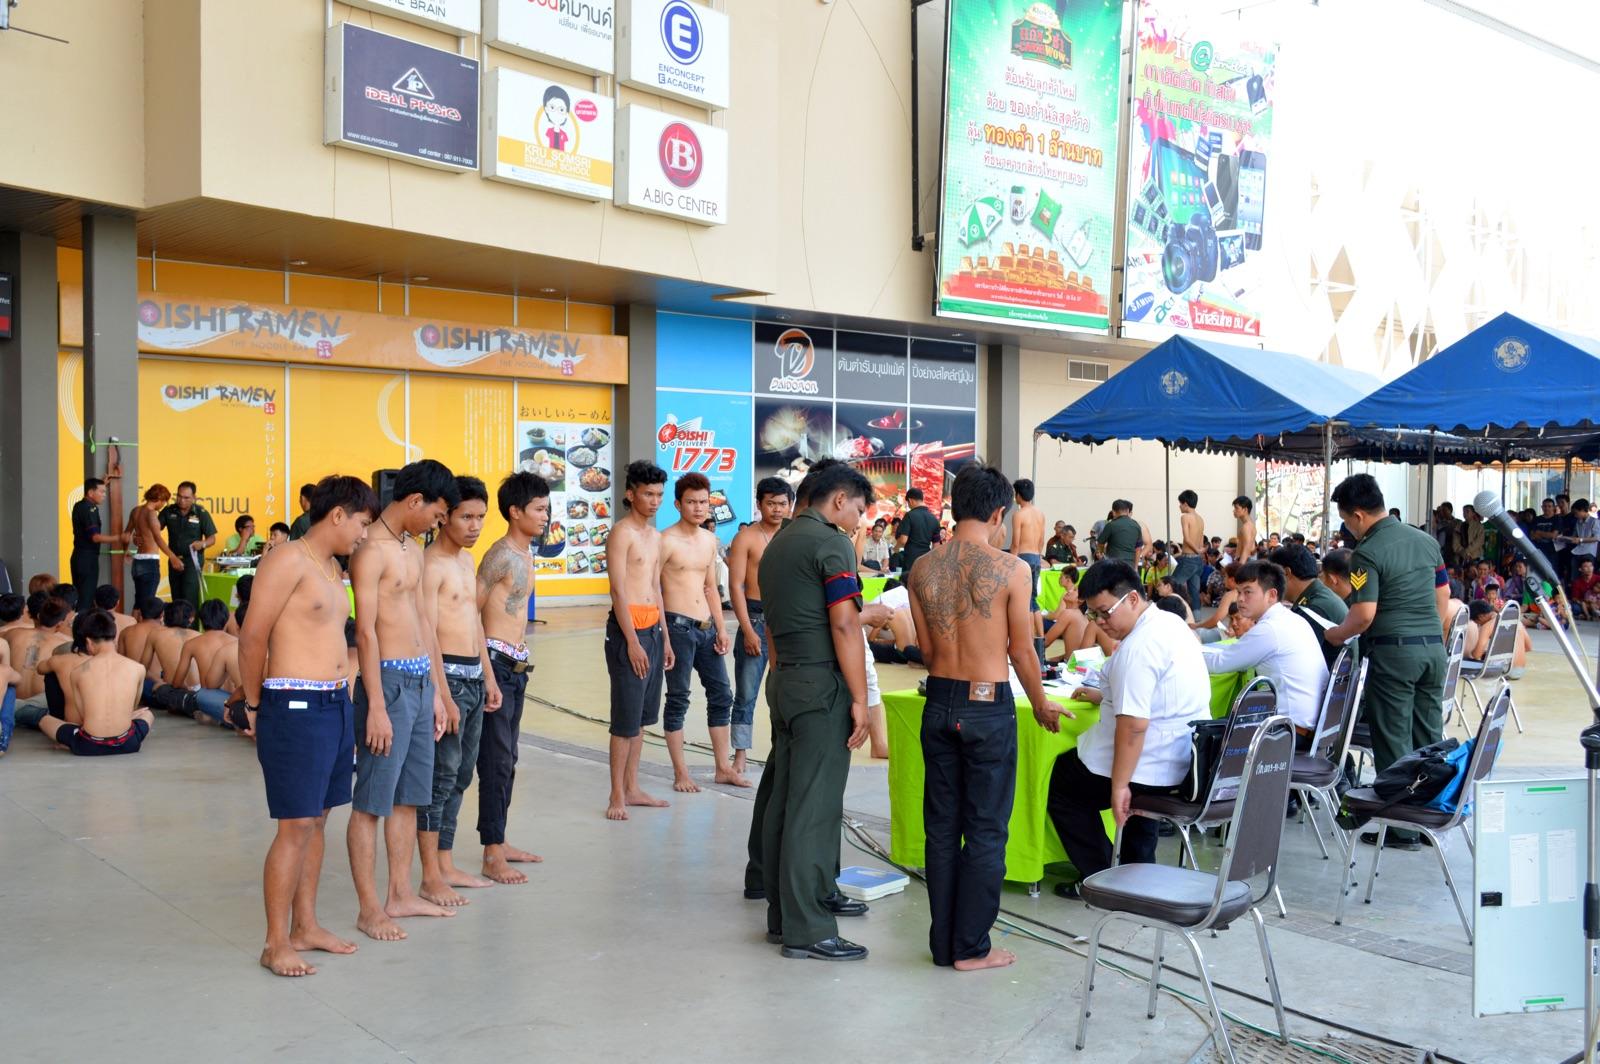 Thai Conscription - New Naratif